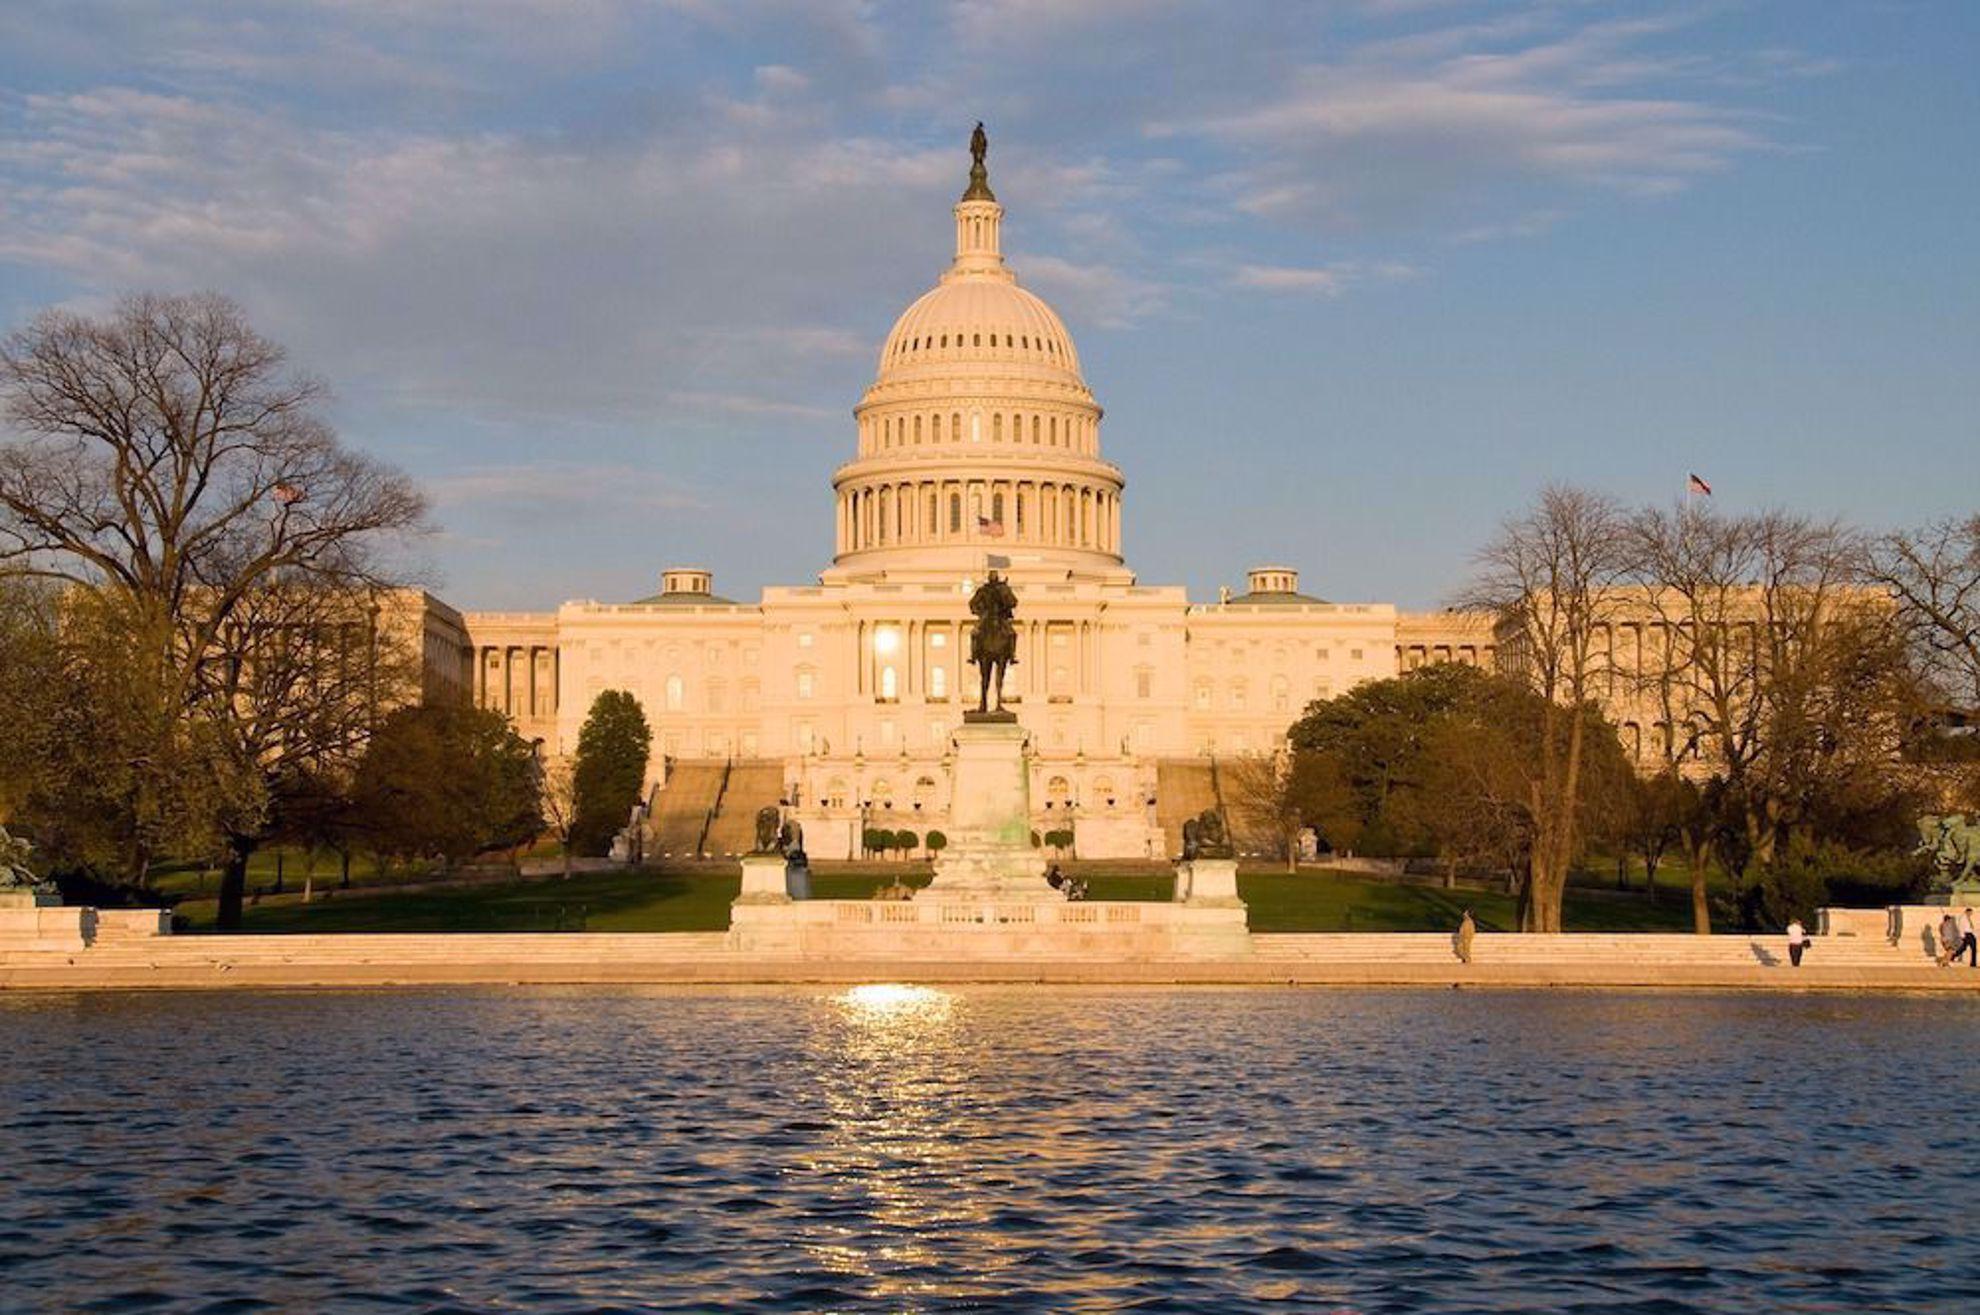 Capitol building Washington DC at sunset